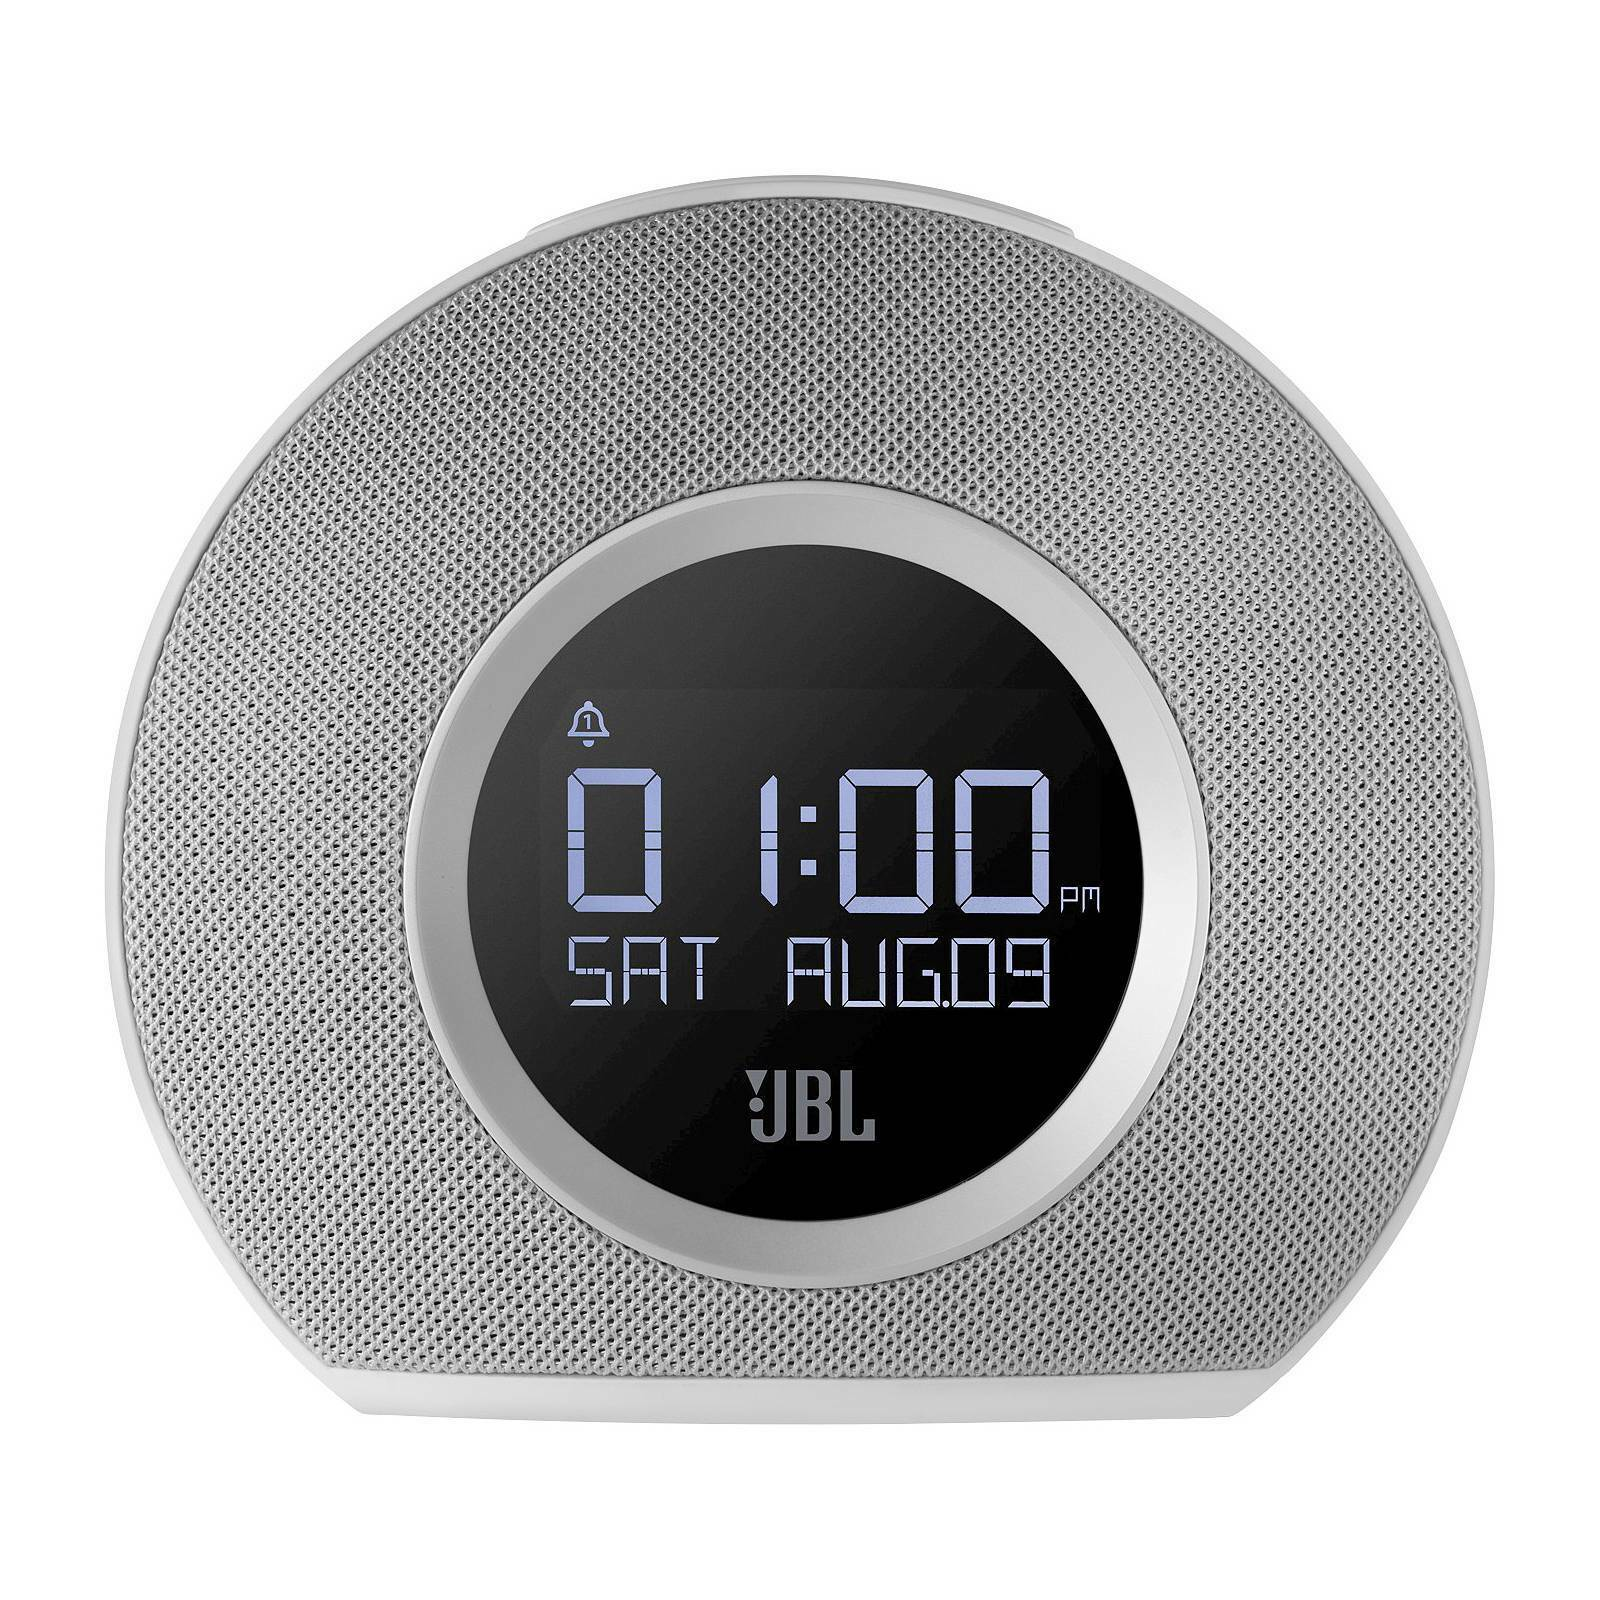 Ihome Triple Display Alarm Clock Wireless Charging - Arm Designs